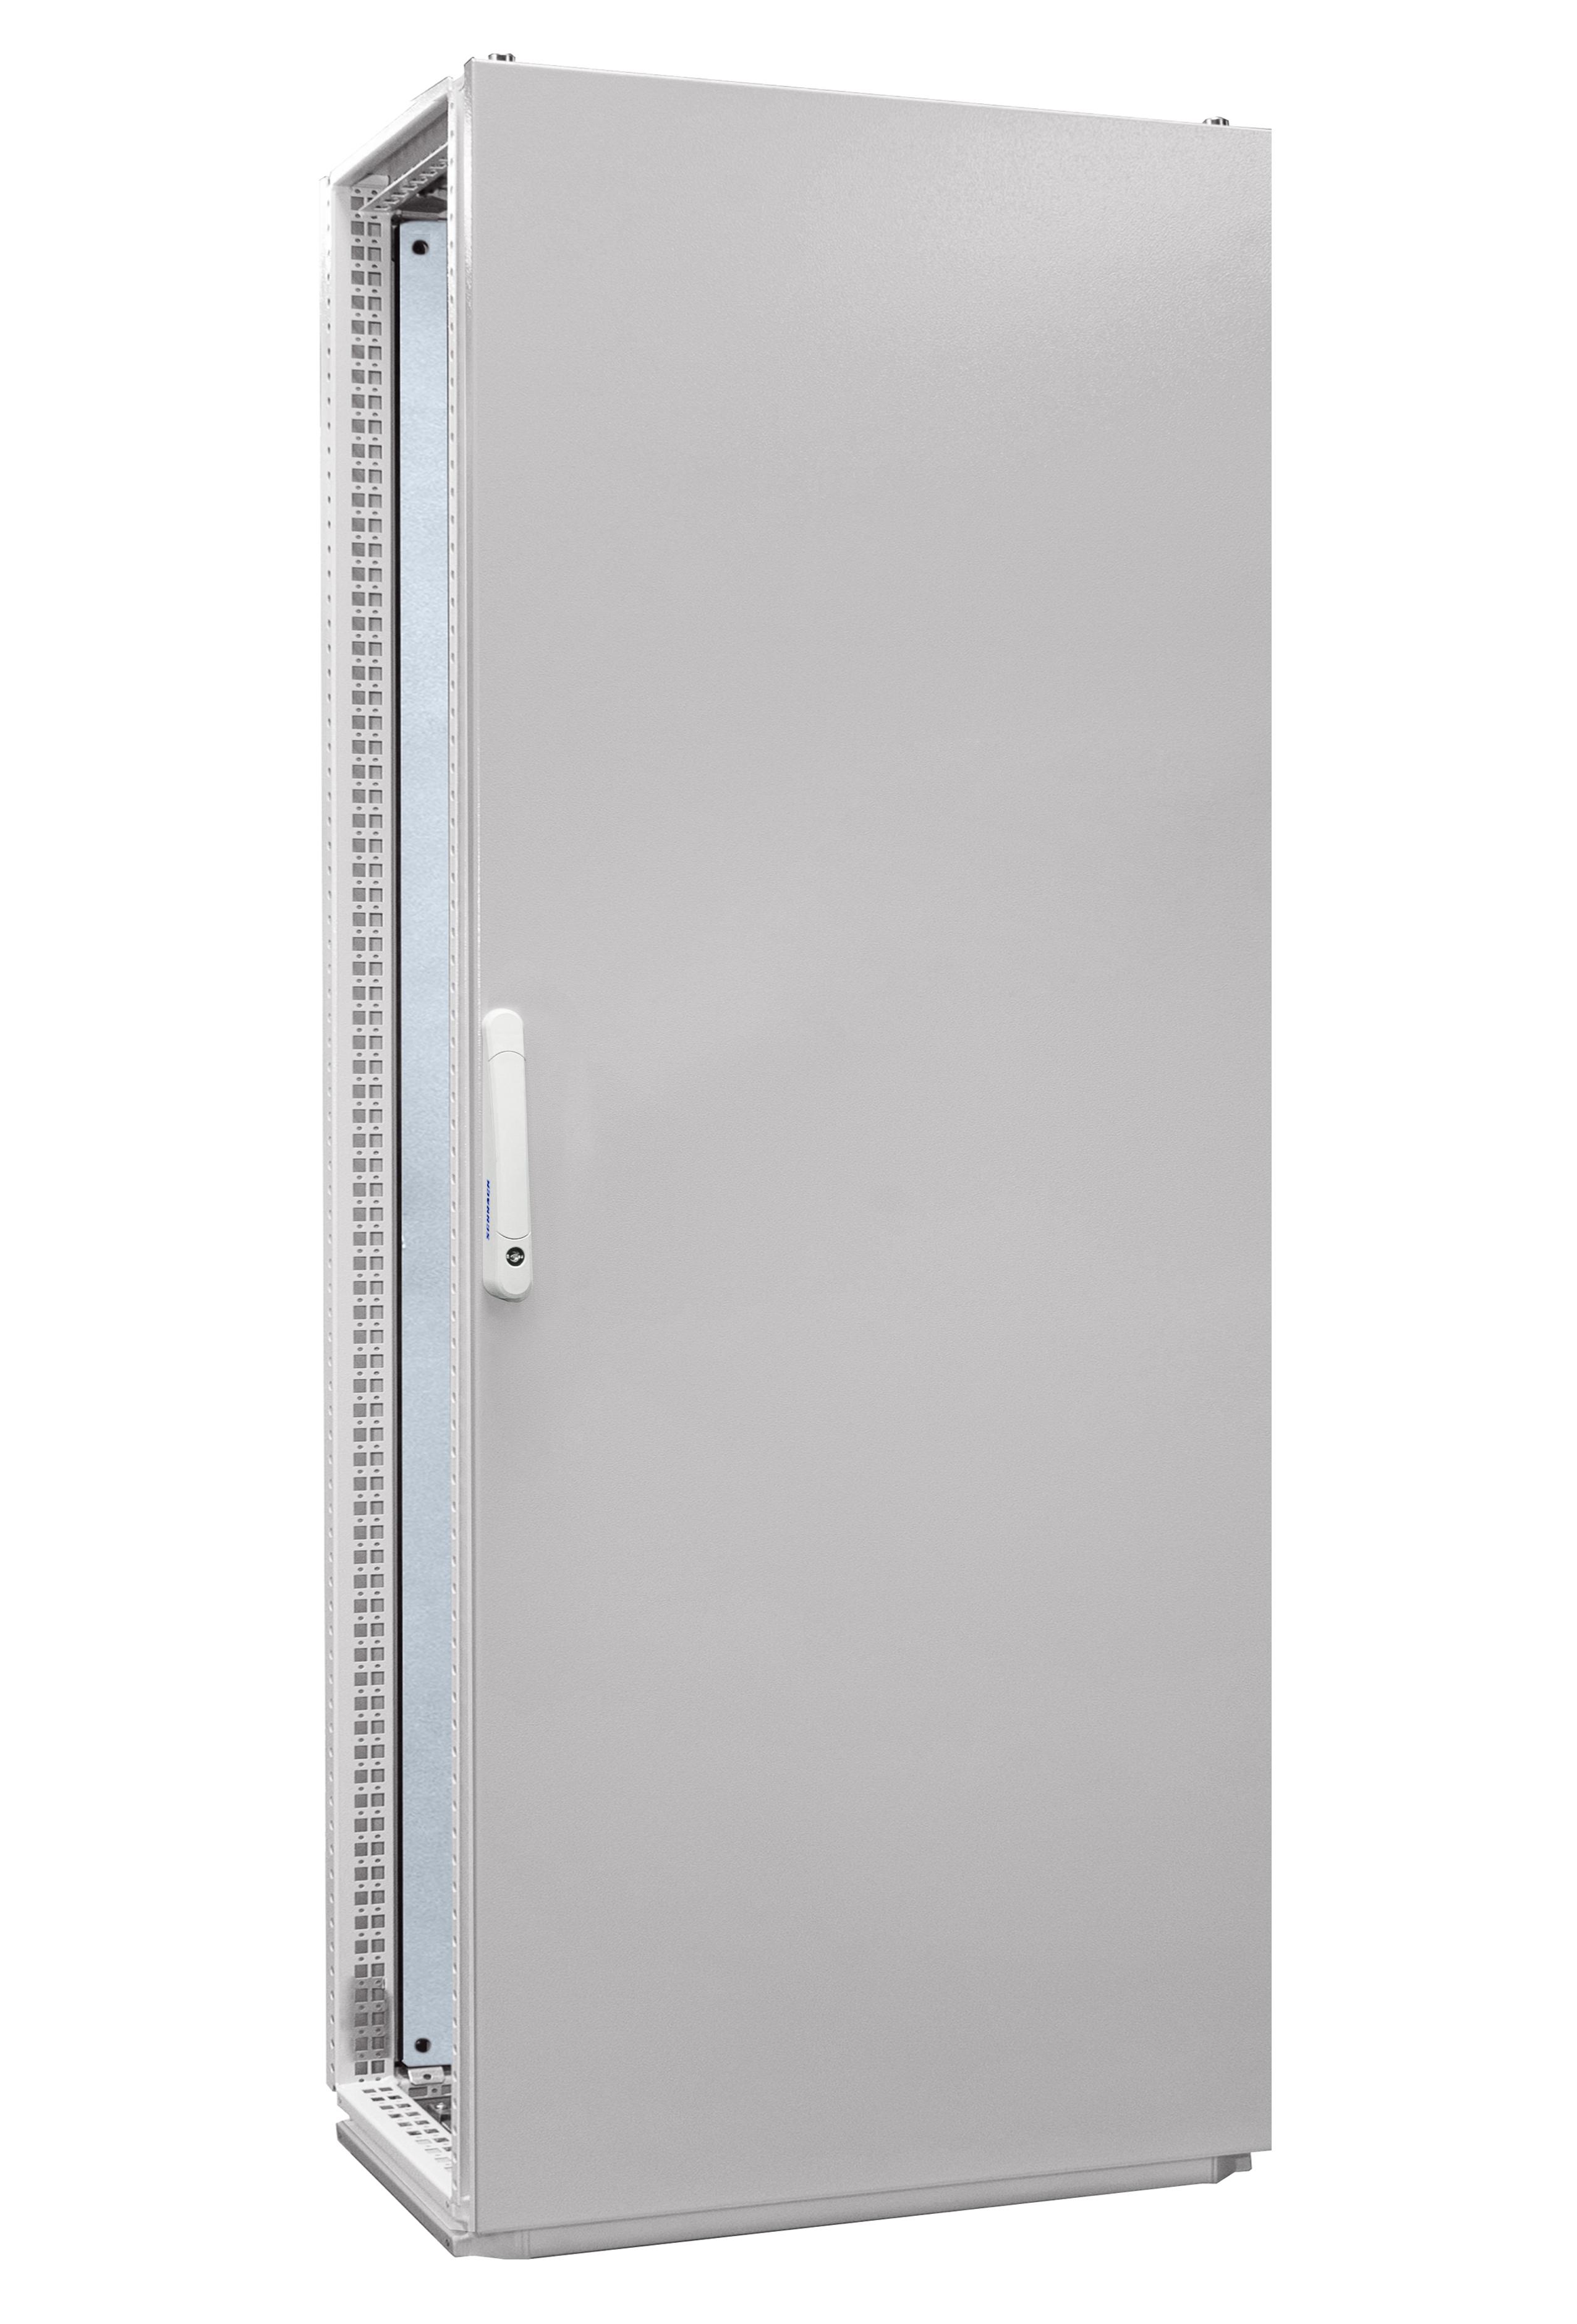 1 Stk Anreihschrank 1-Tür IP55 H=2000 B=800 T=500mm Stahlblech AC208050--